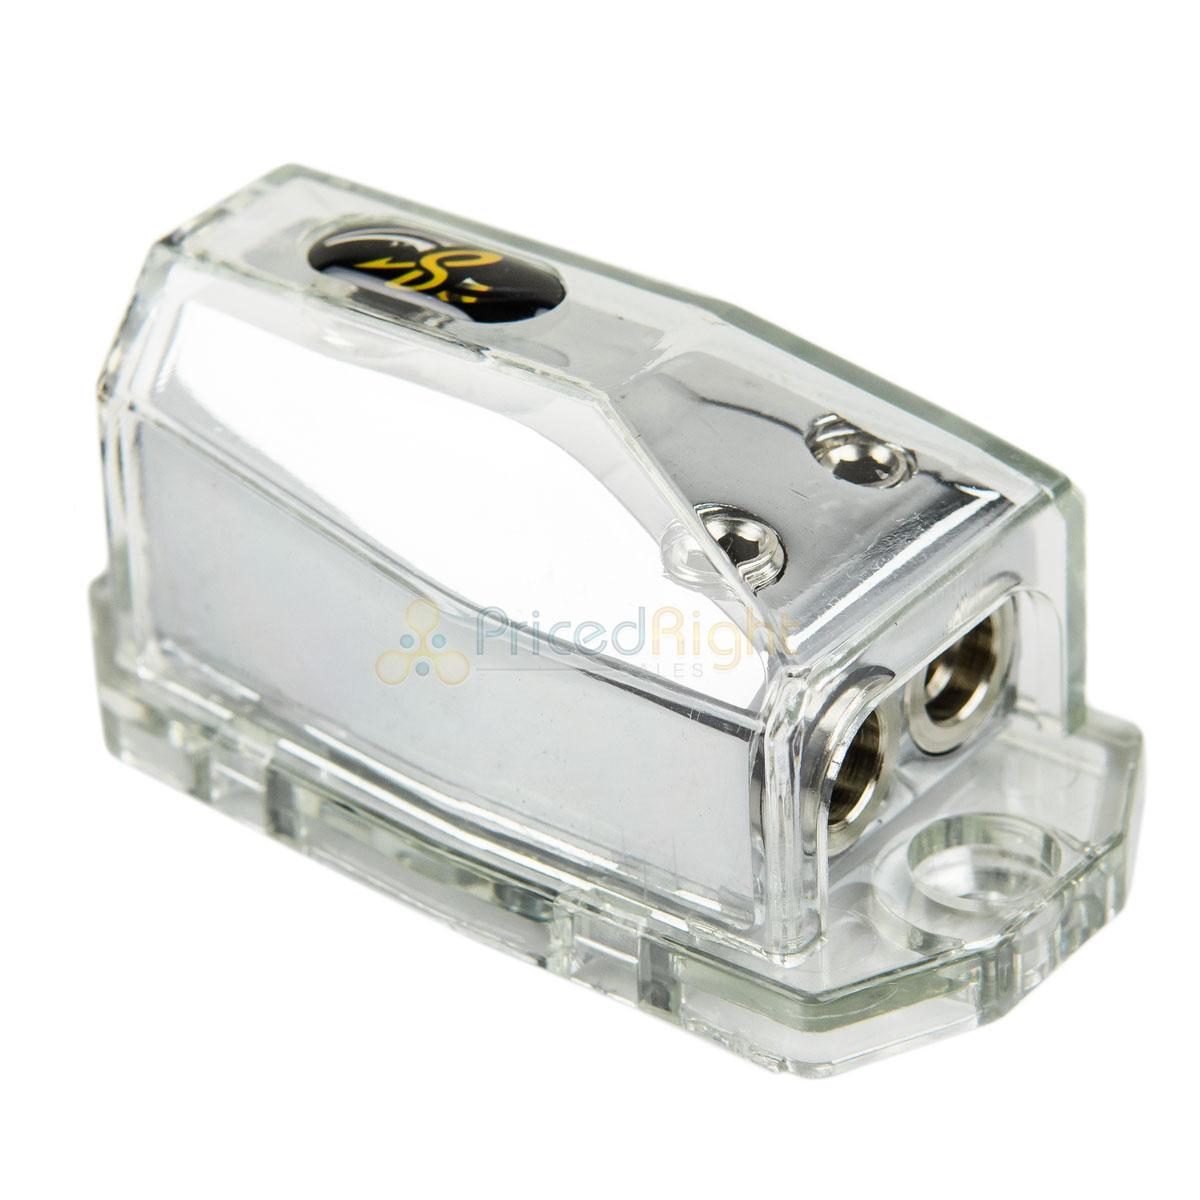 1//0Gauge Input 4Gauge Output 1 3 New Stinger Power Distribution Block SPD515